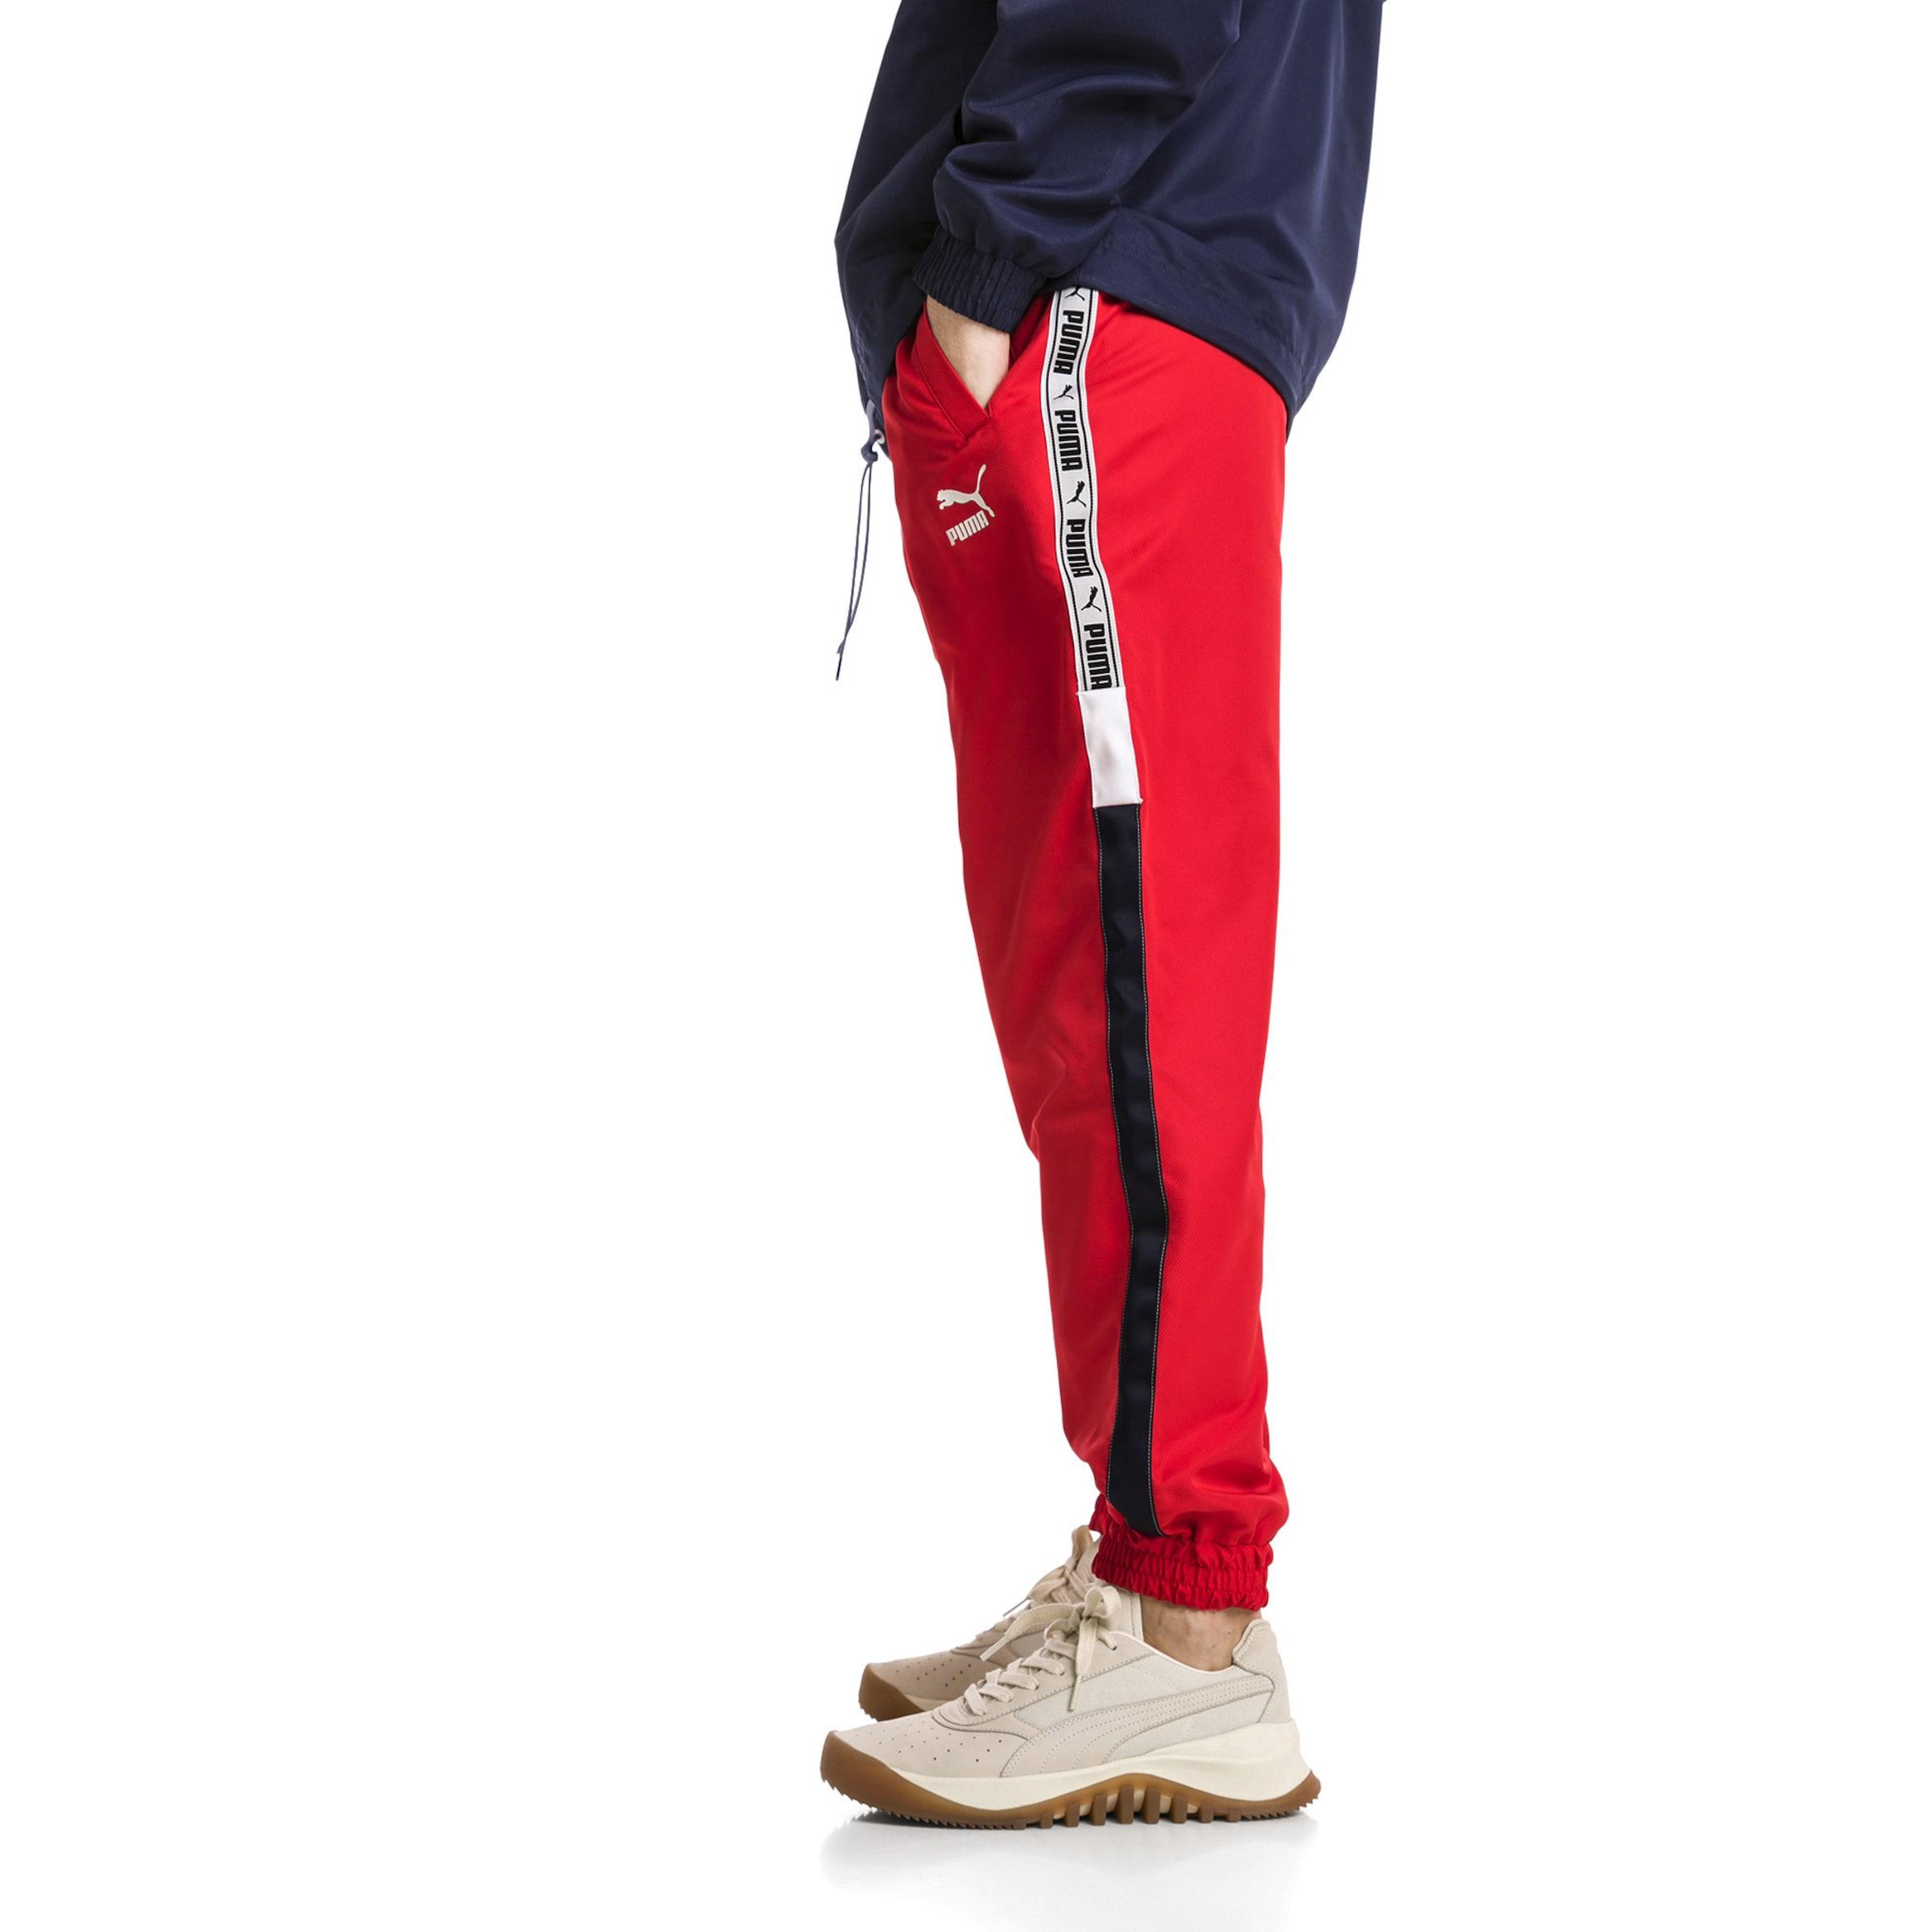 Pantalon En Blanc Noir OutremerJaune Bleu Vert Foncé Puma 'xtg' SVpGLqUzM